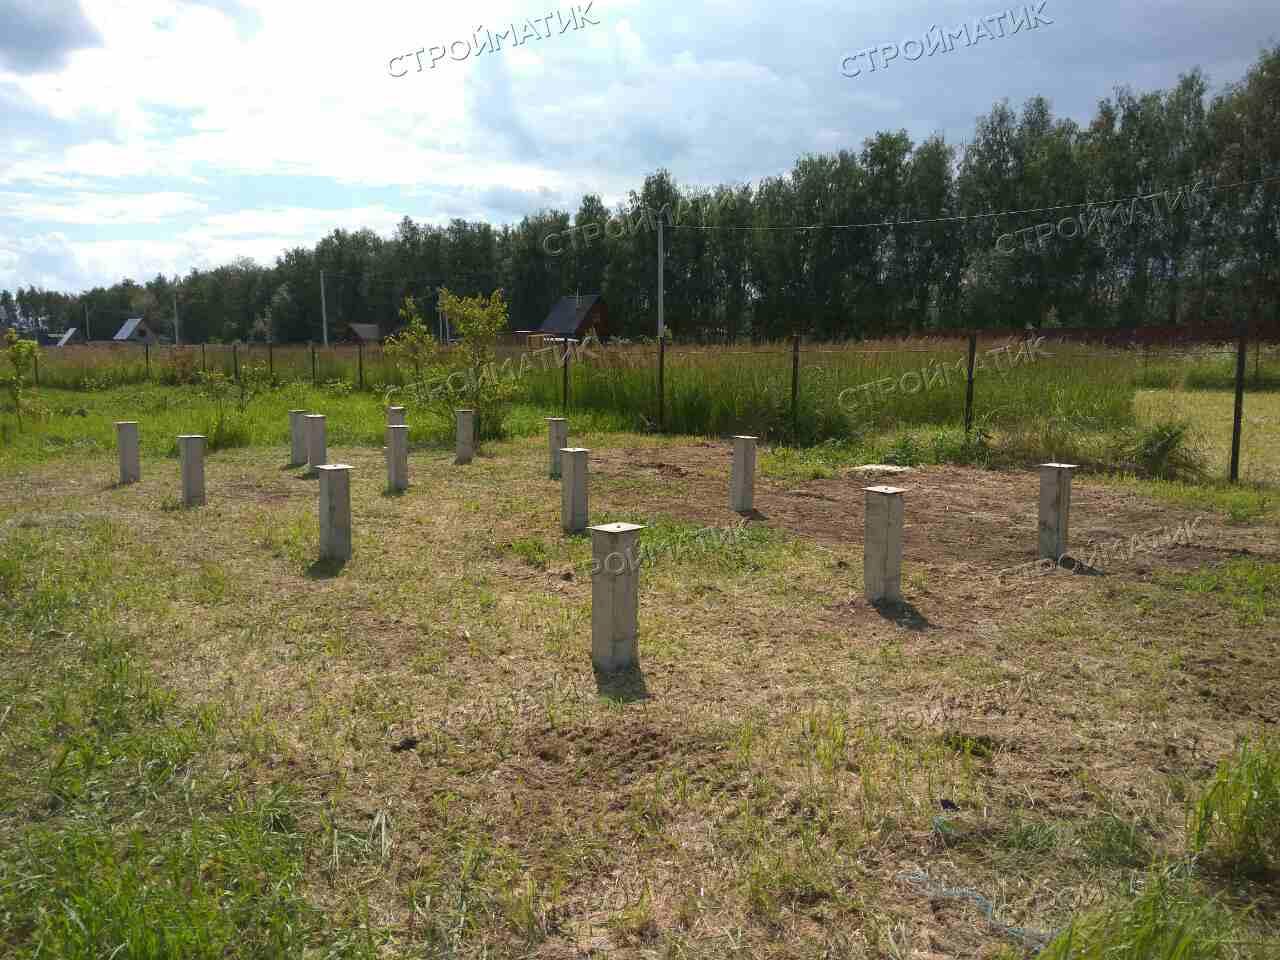 Фундамент для дома на ж/б сваях в селе Мячково Московской области от компании Стройматик